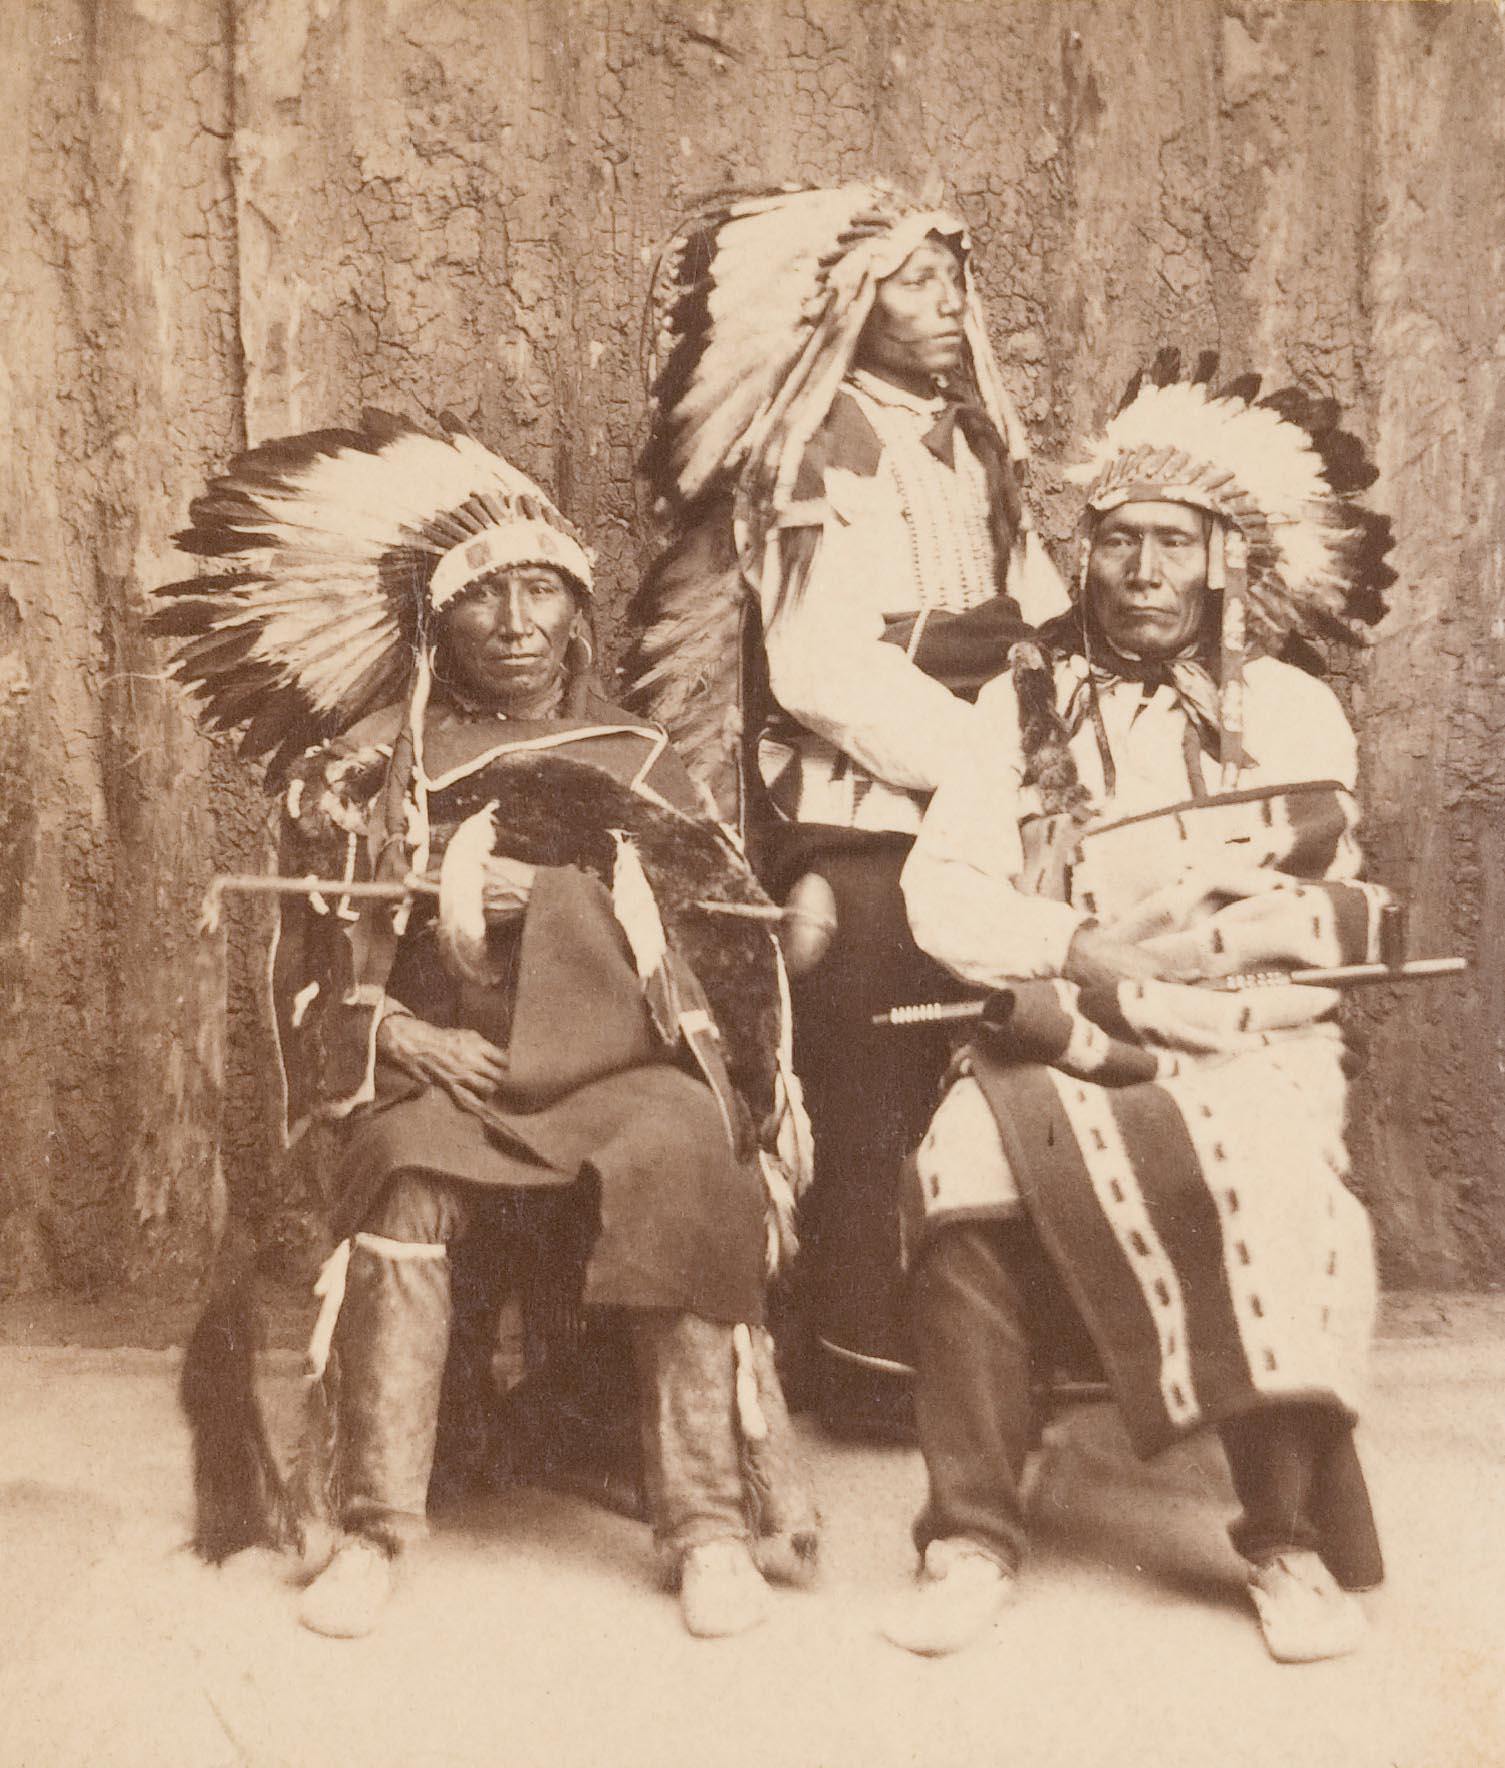 http://www.american-tribes.com/messageboards/dietmar/Morrow1.jpg